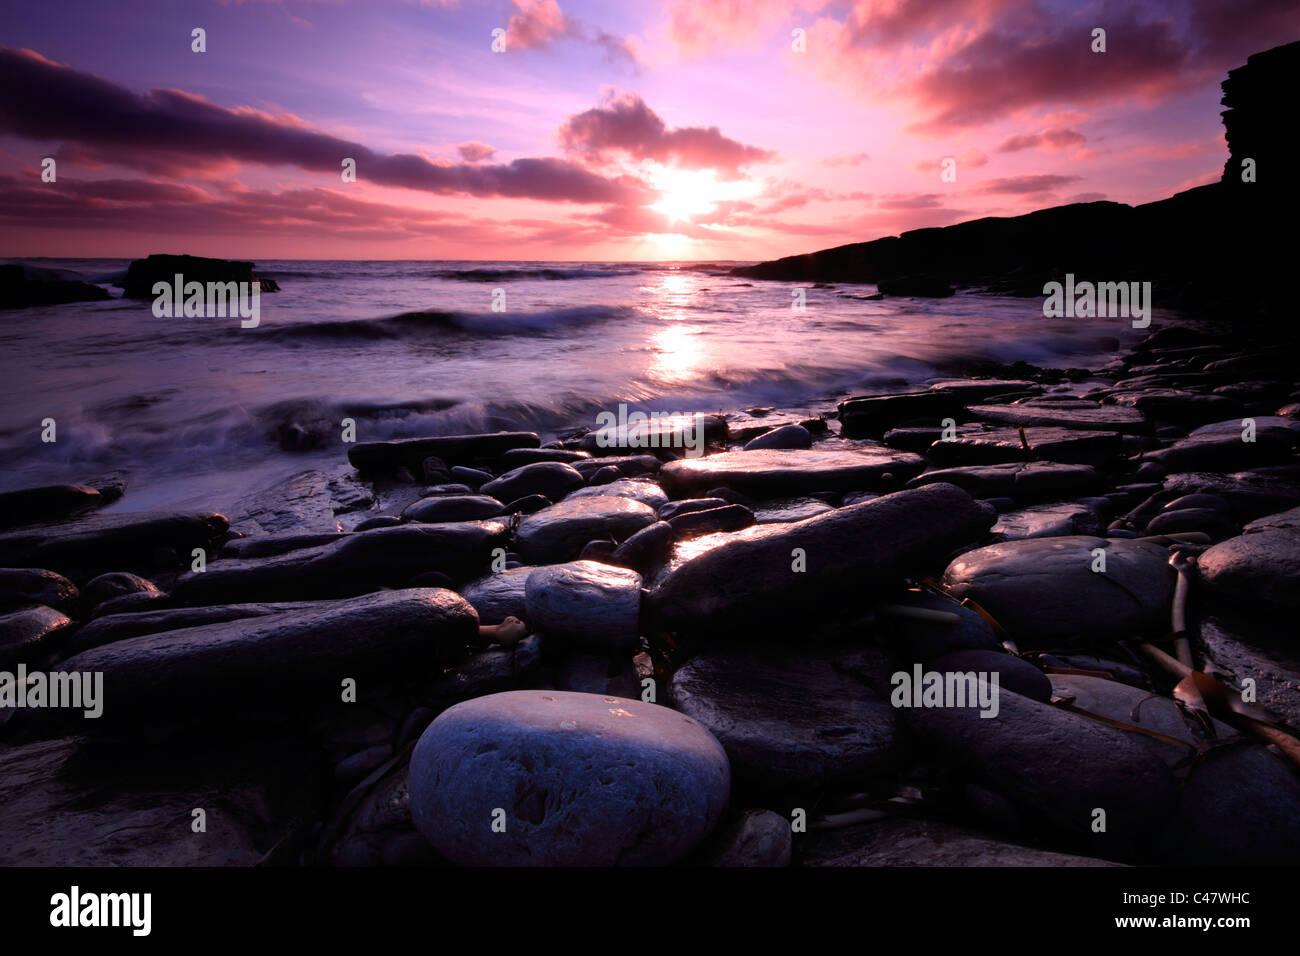 Orkney, Sandgeo bay - Stock Image